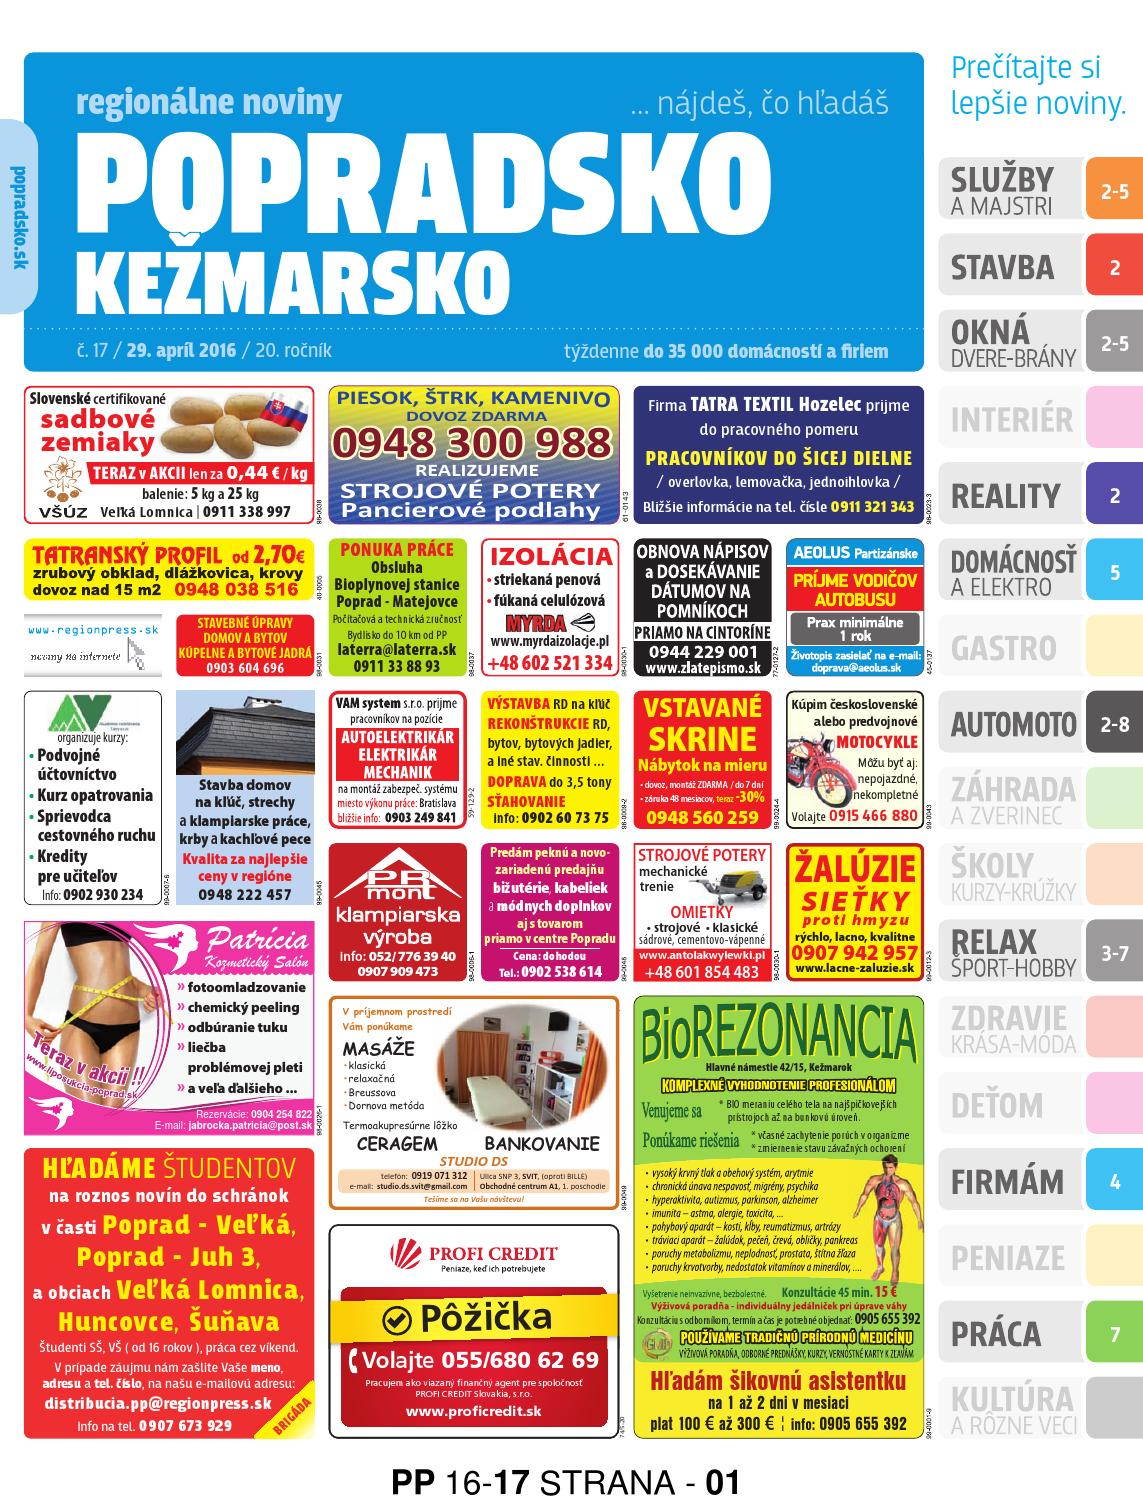 Ukrajinská datovania etiketa